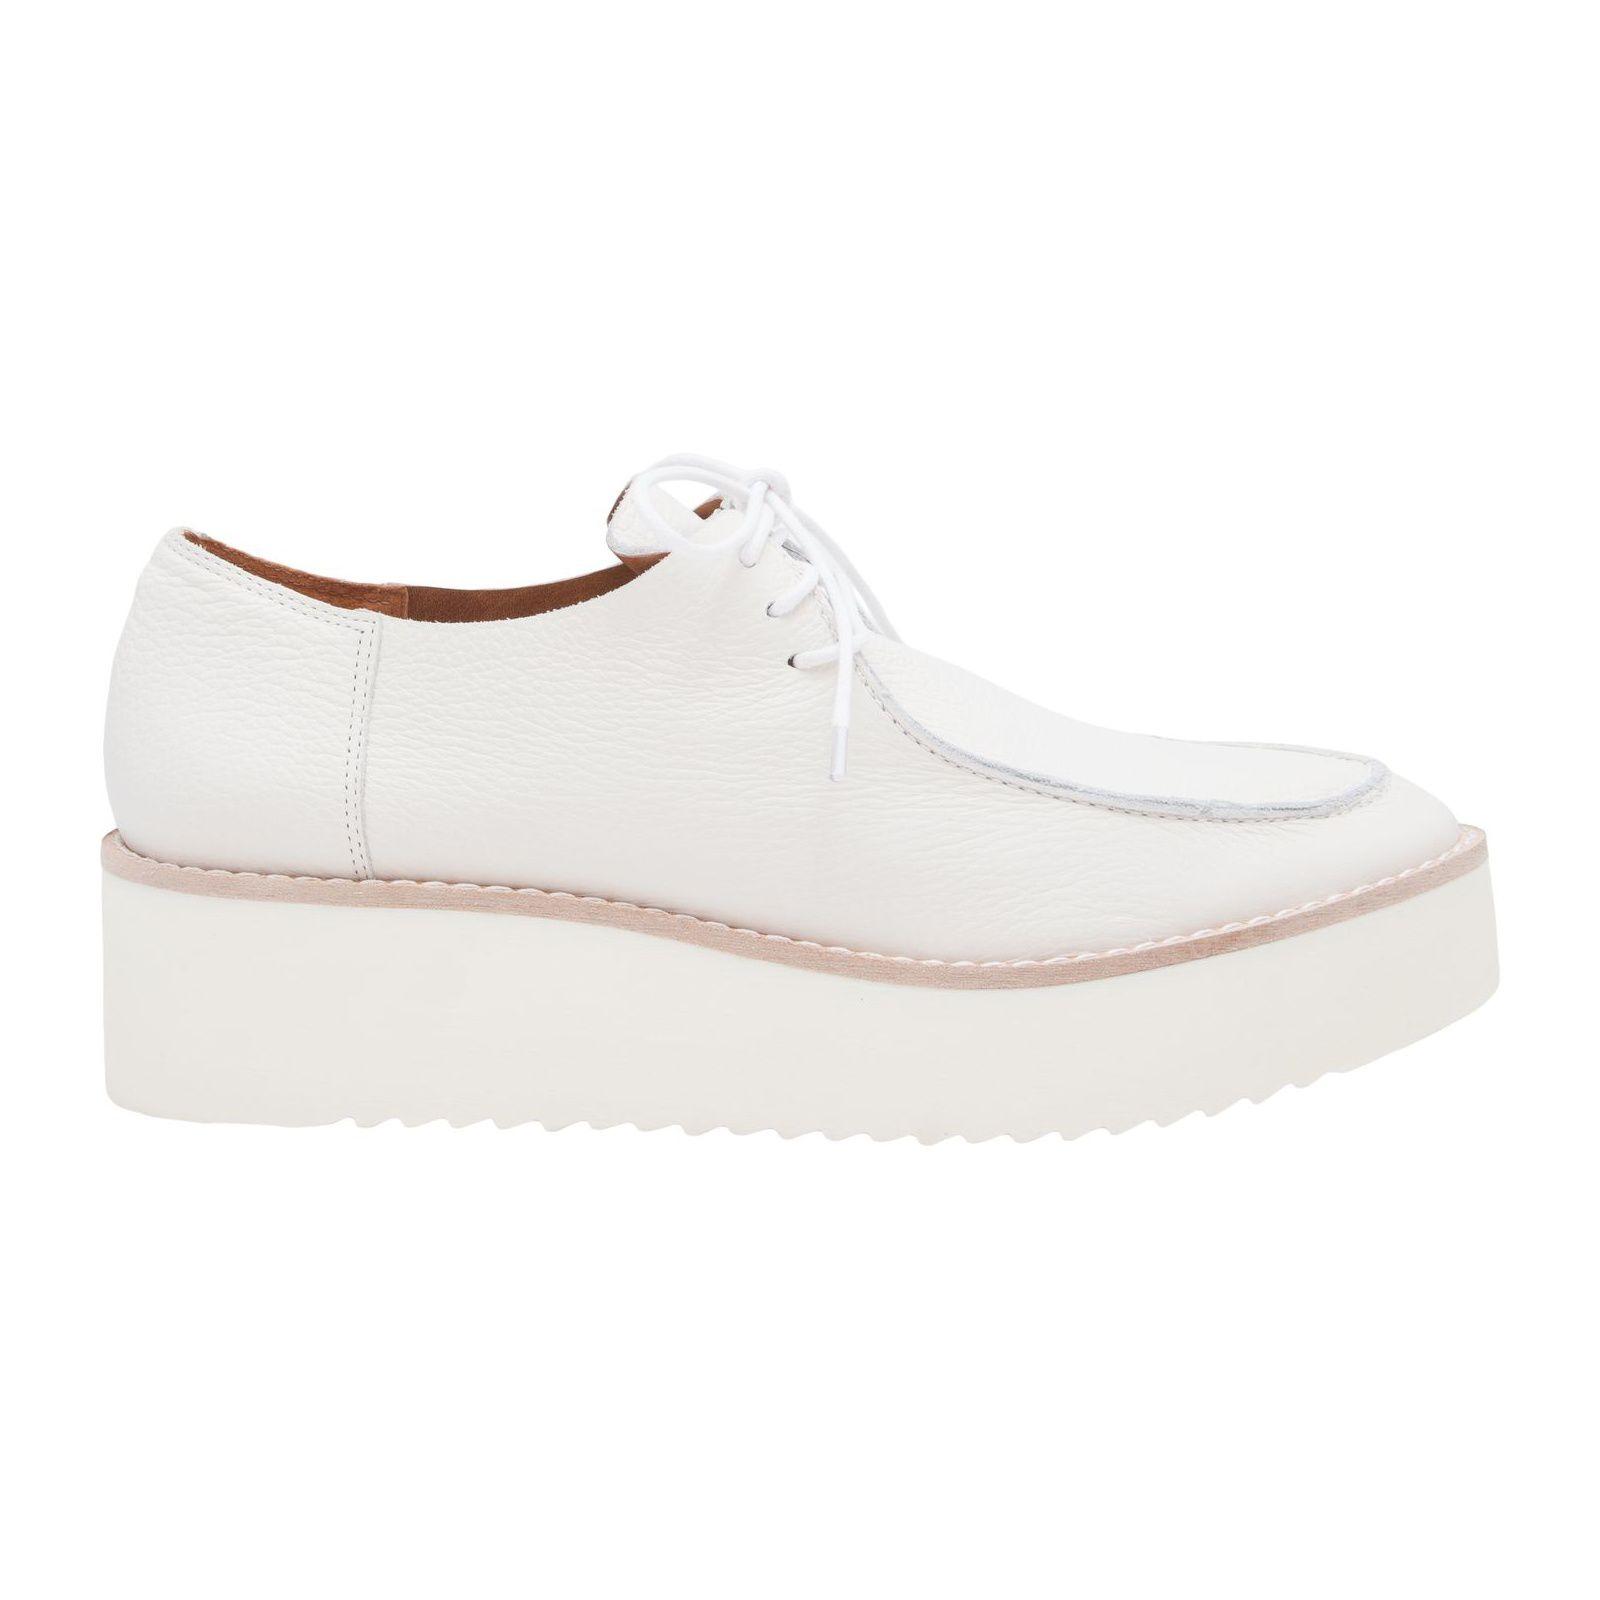 Sapato Flatform Nórdico